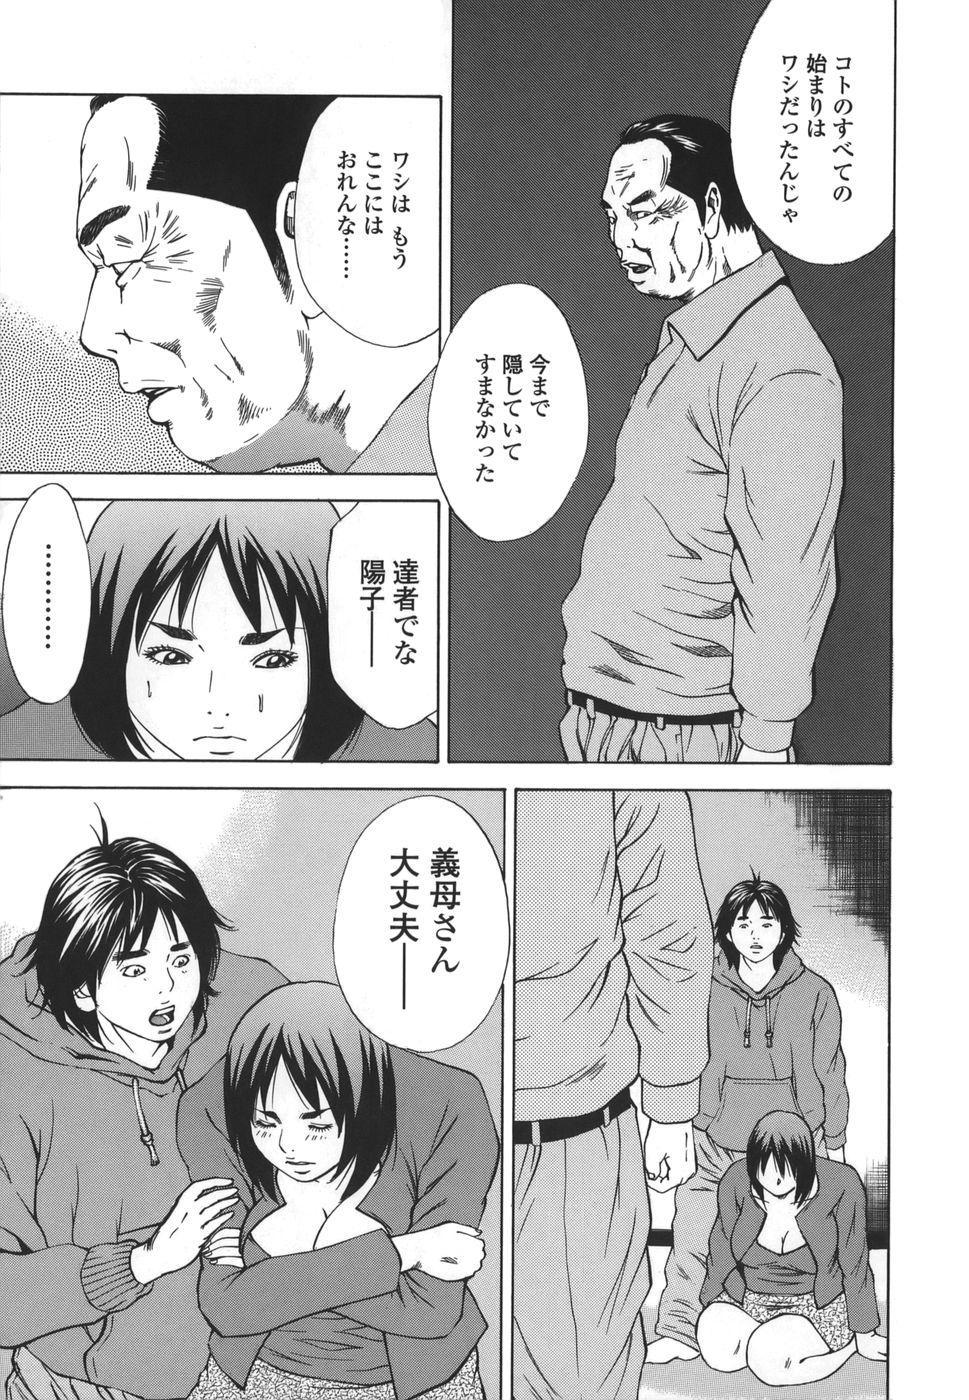 Kinshin Goukan - Near Relation Rapes 196